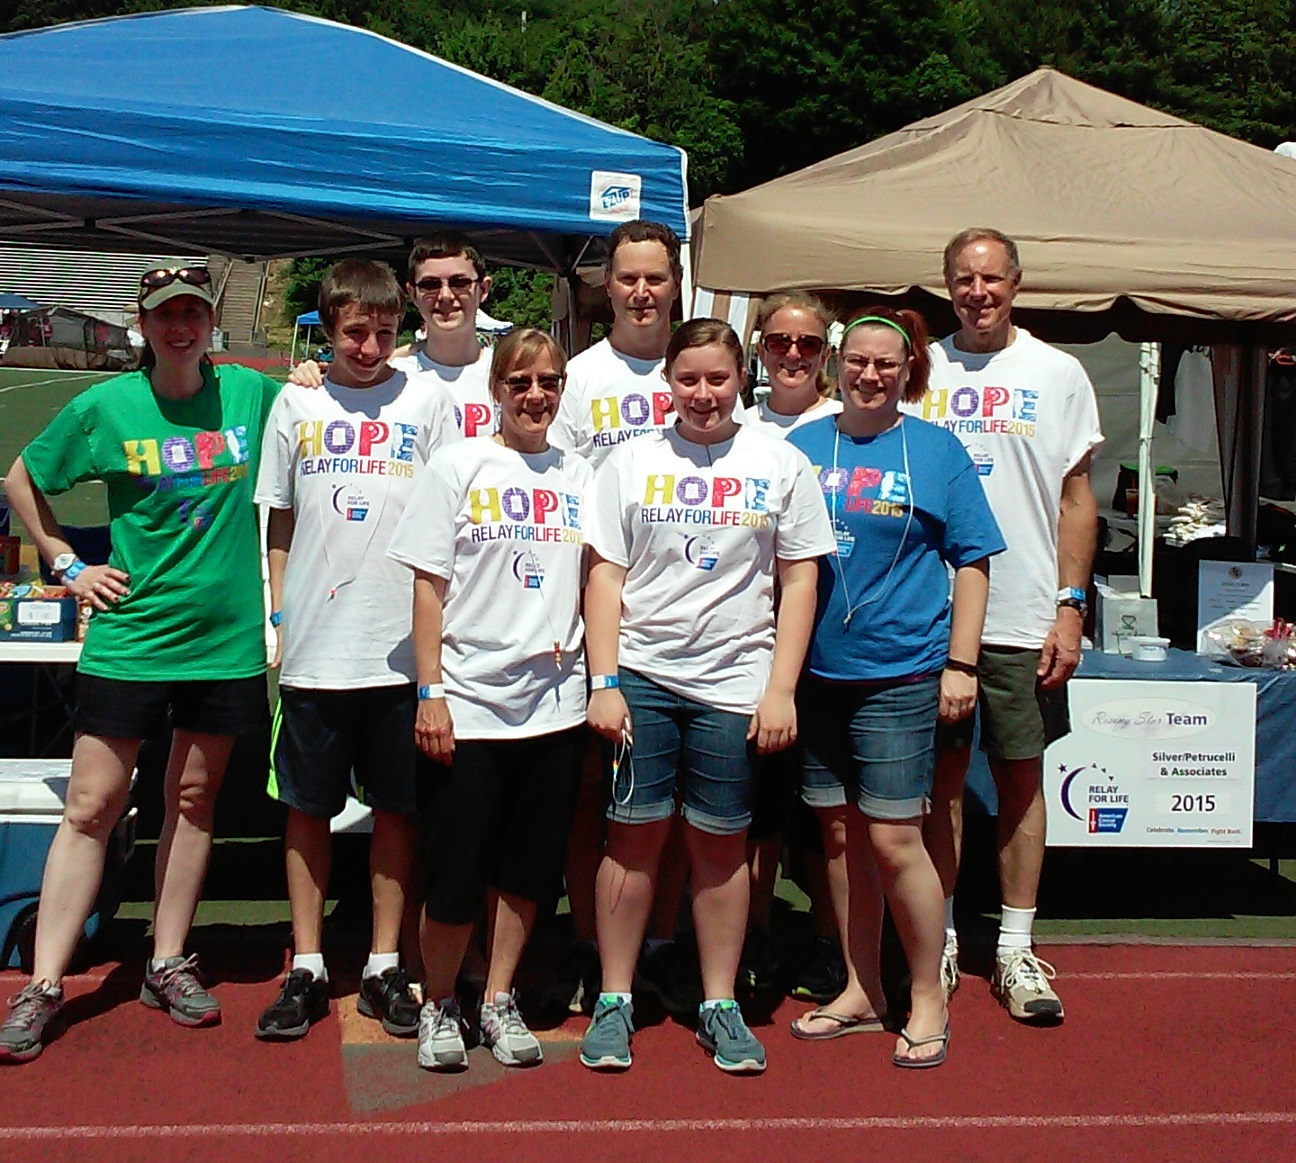 SPA relay team 2015.jpg